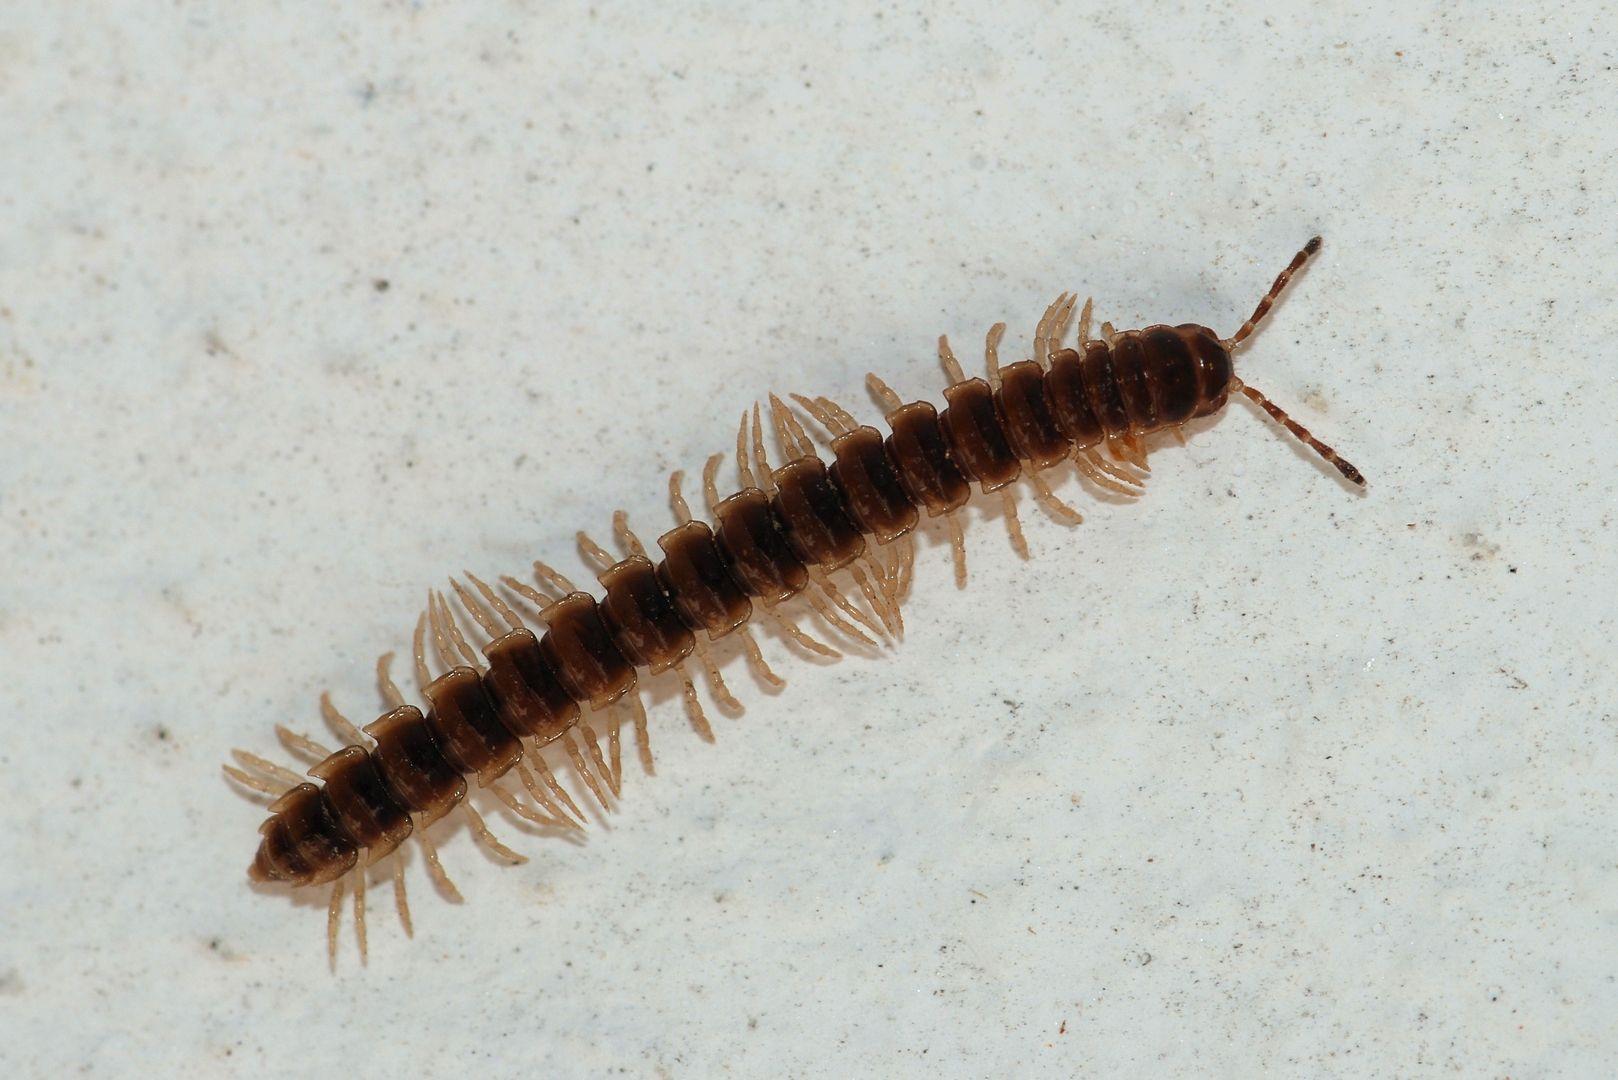 Millipede Centipede, Amber fossils, Millipede